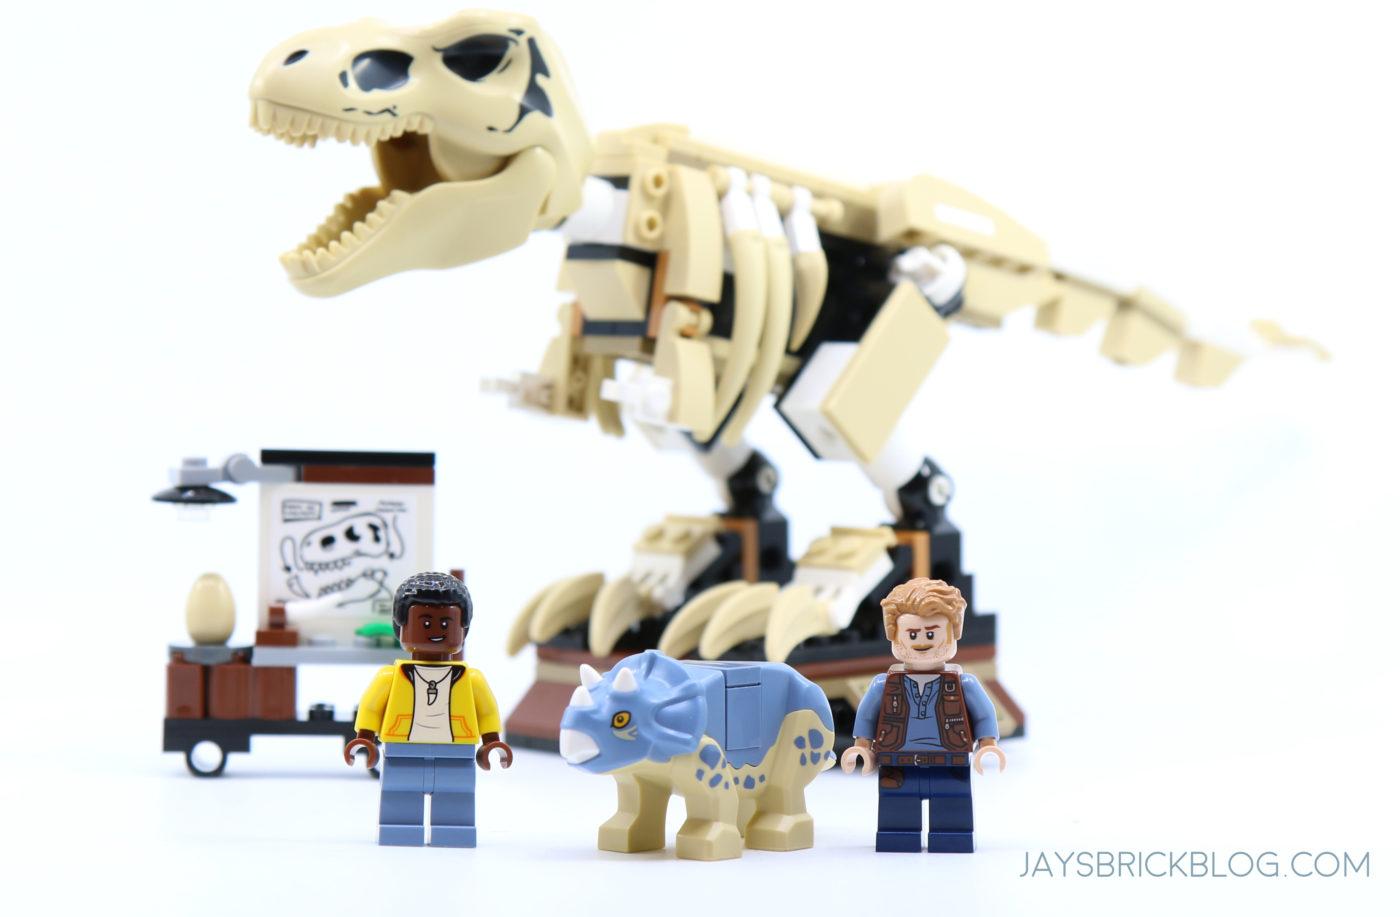 LEGO 76940 T. rex Dinosaur Fossil Exhibition Minifigures